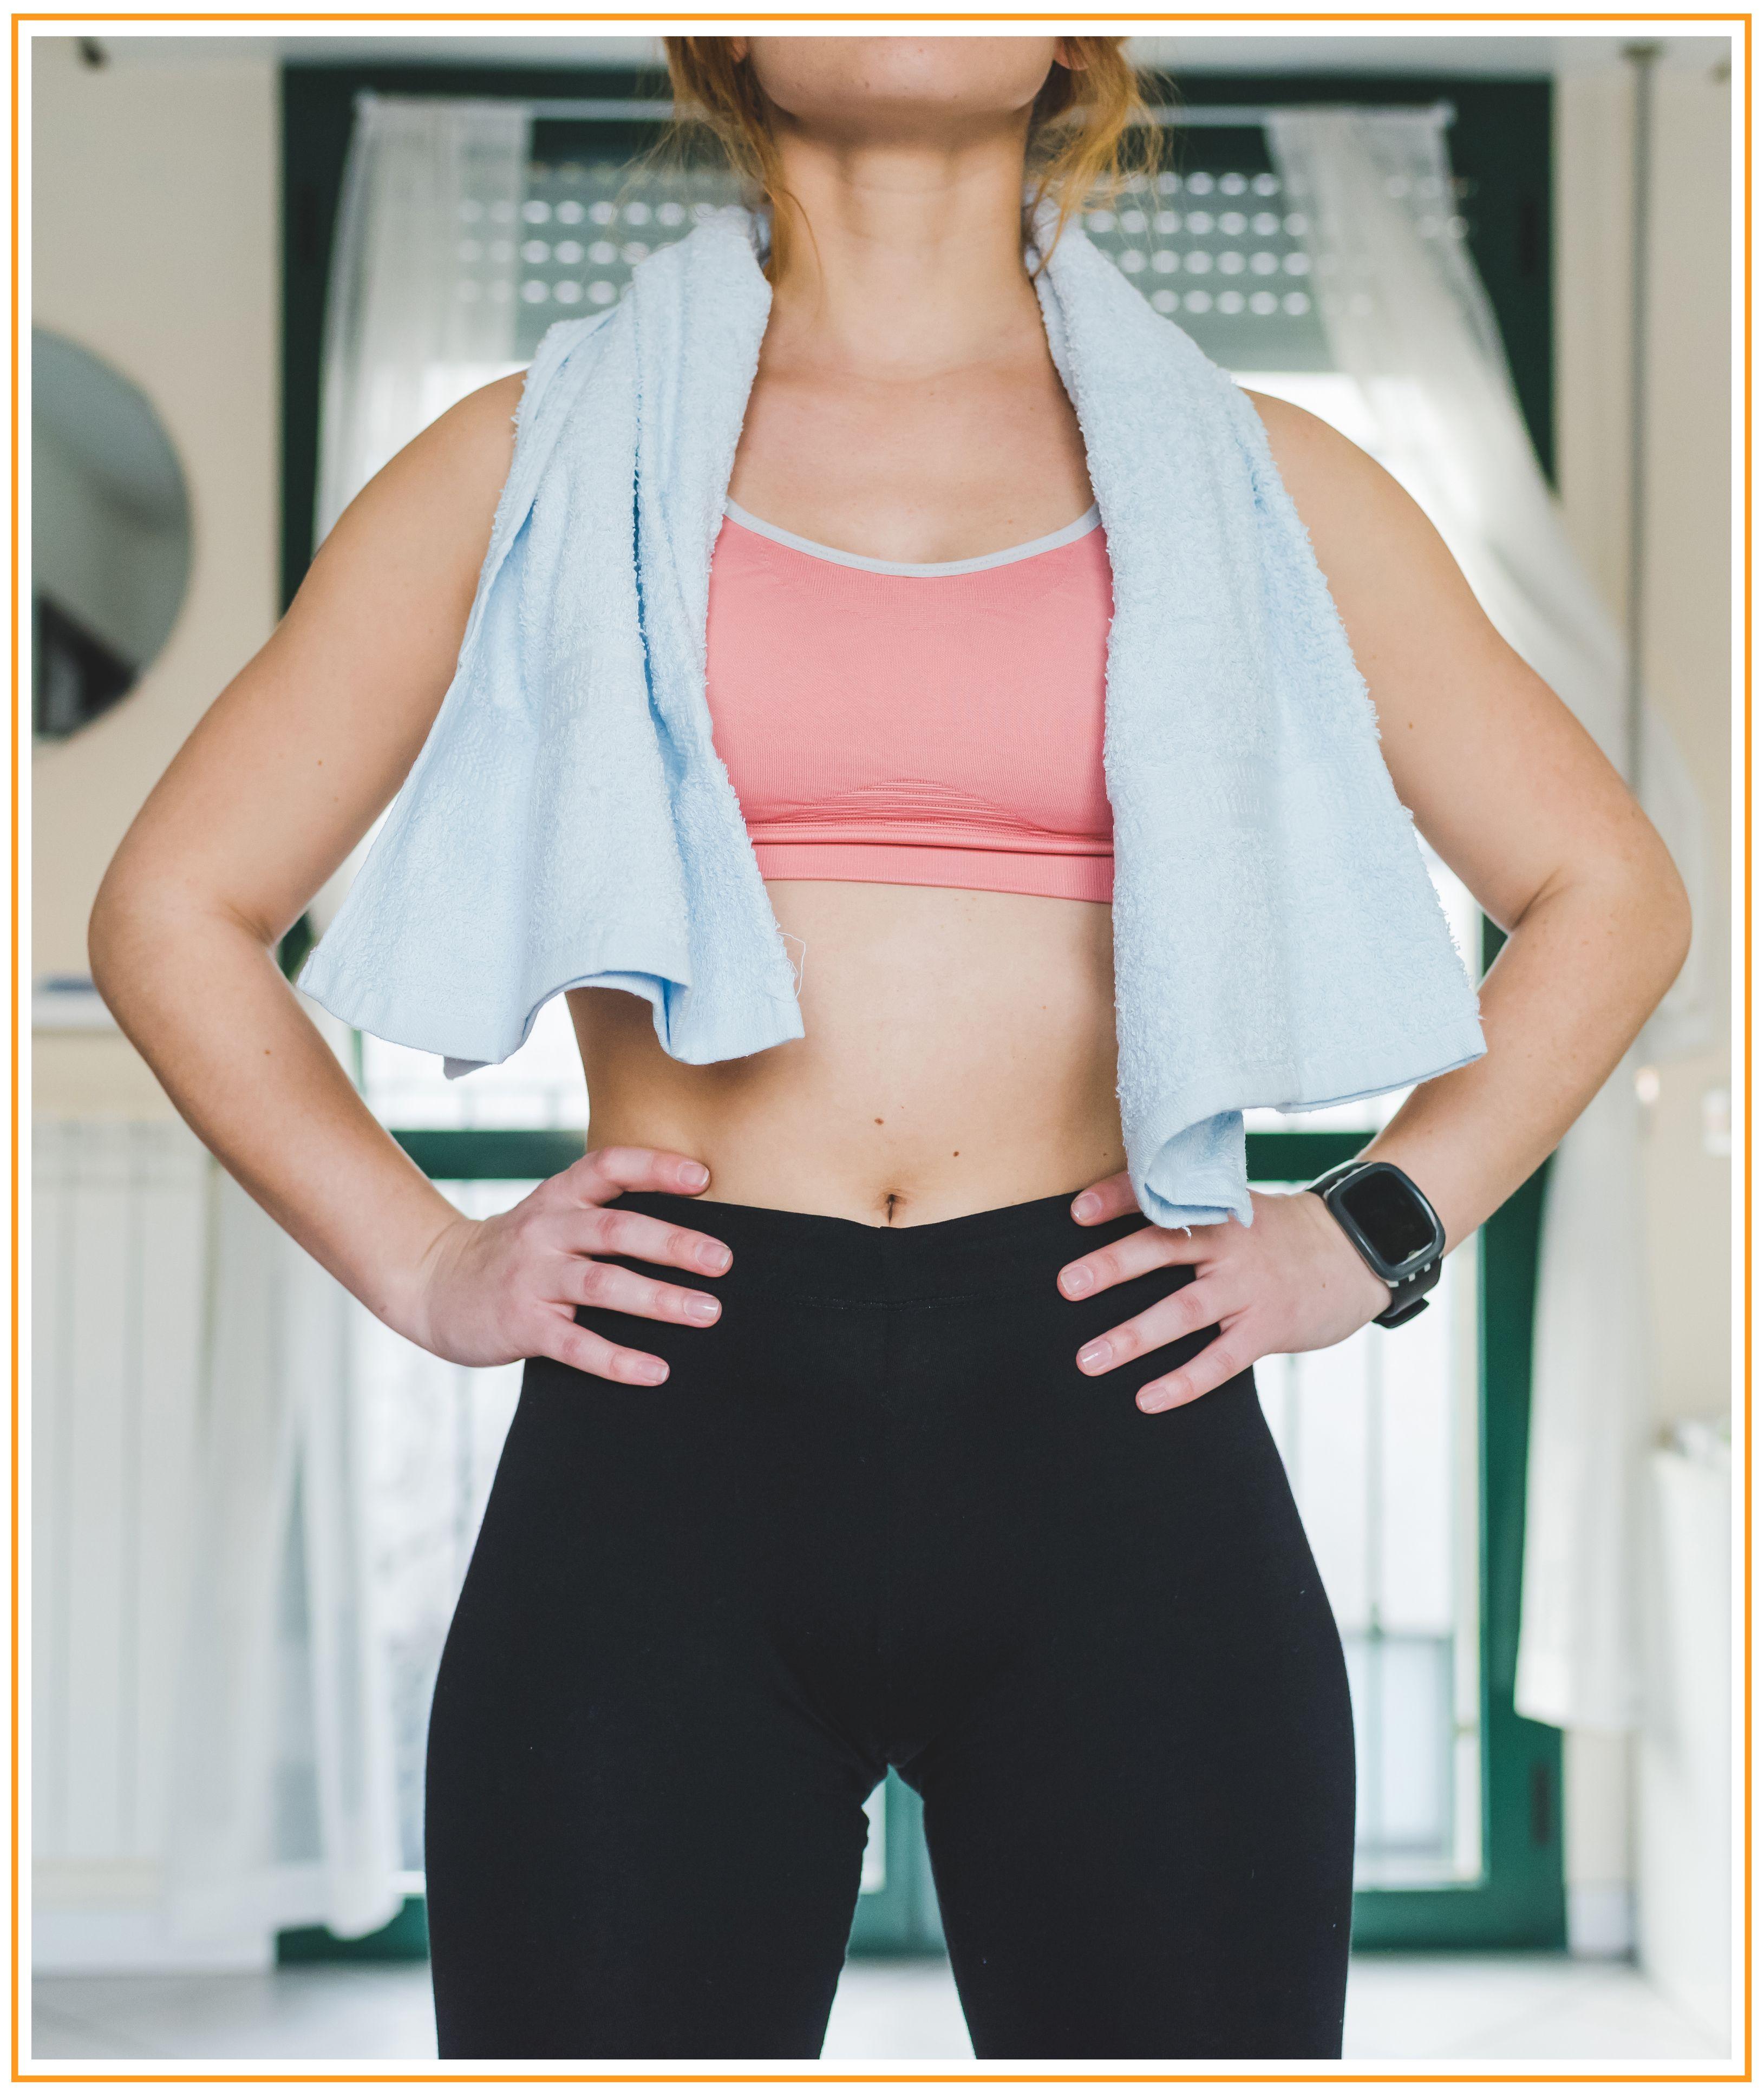 12 Life-Changing Kegel Exercises